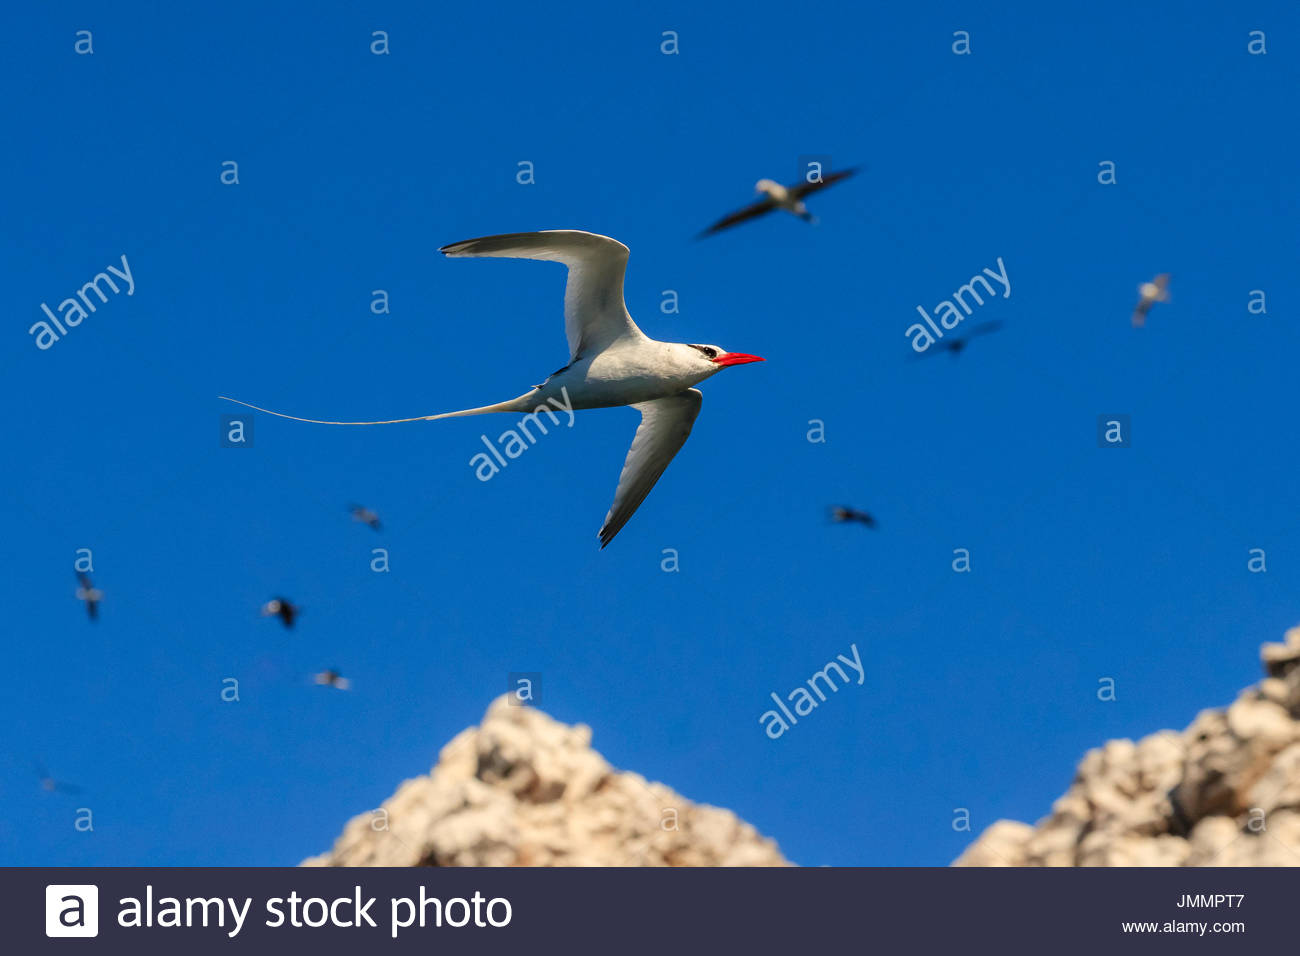 Red-billed tropic bird, Phaethon aethereus, in flight at San Pedro Martir Island. - Stock Image